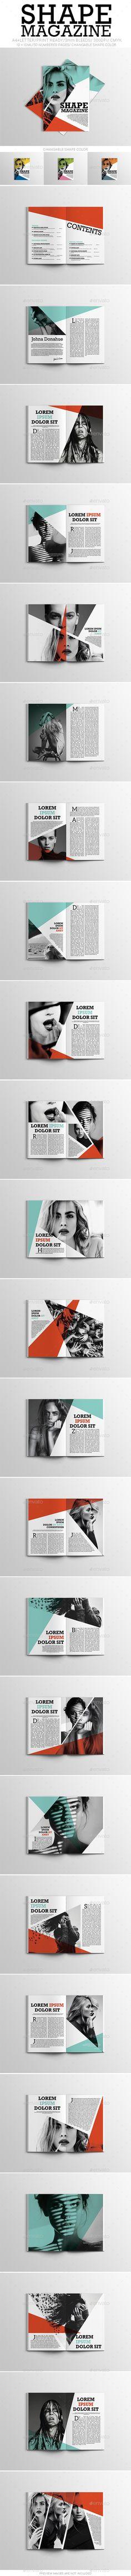 Simple Shape Magazine - Magazines Print Templates Download here: https://graphicriver.net/item/simple-shape-magazine/19978759?ref=classicdesignp